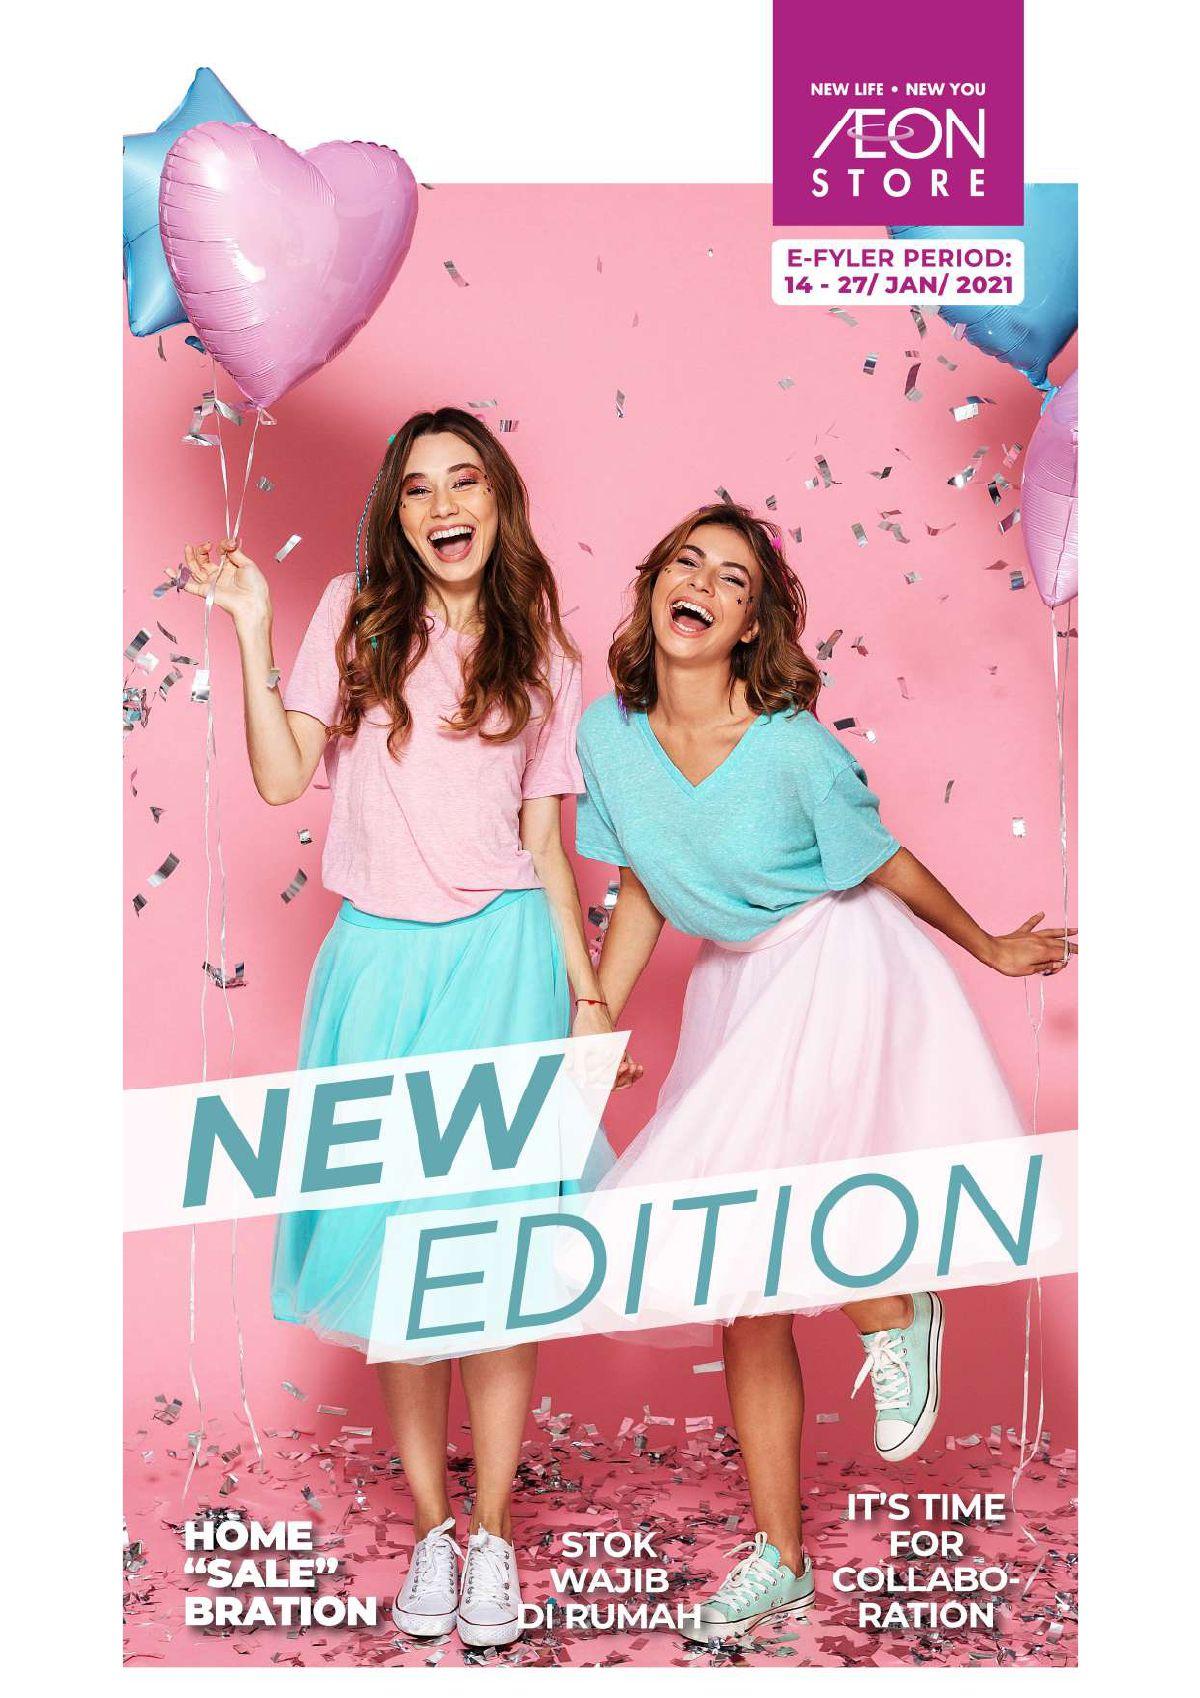 Katalog Promo Aeon Store Indonesia periode 14-27 Januari 2021